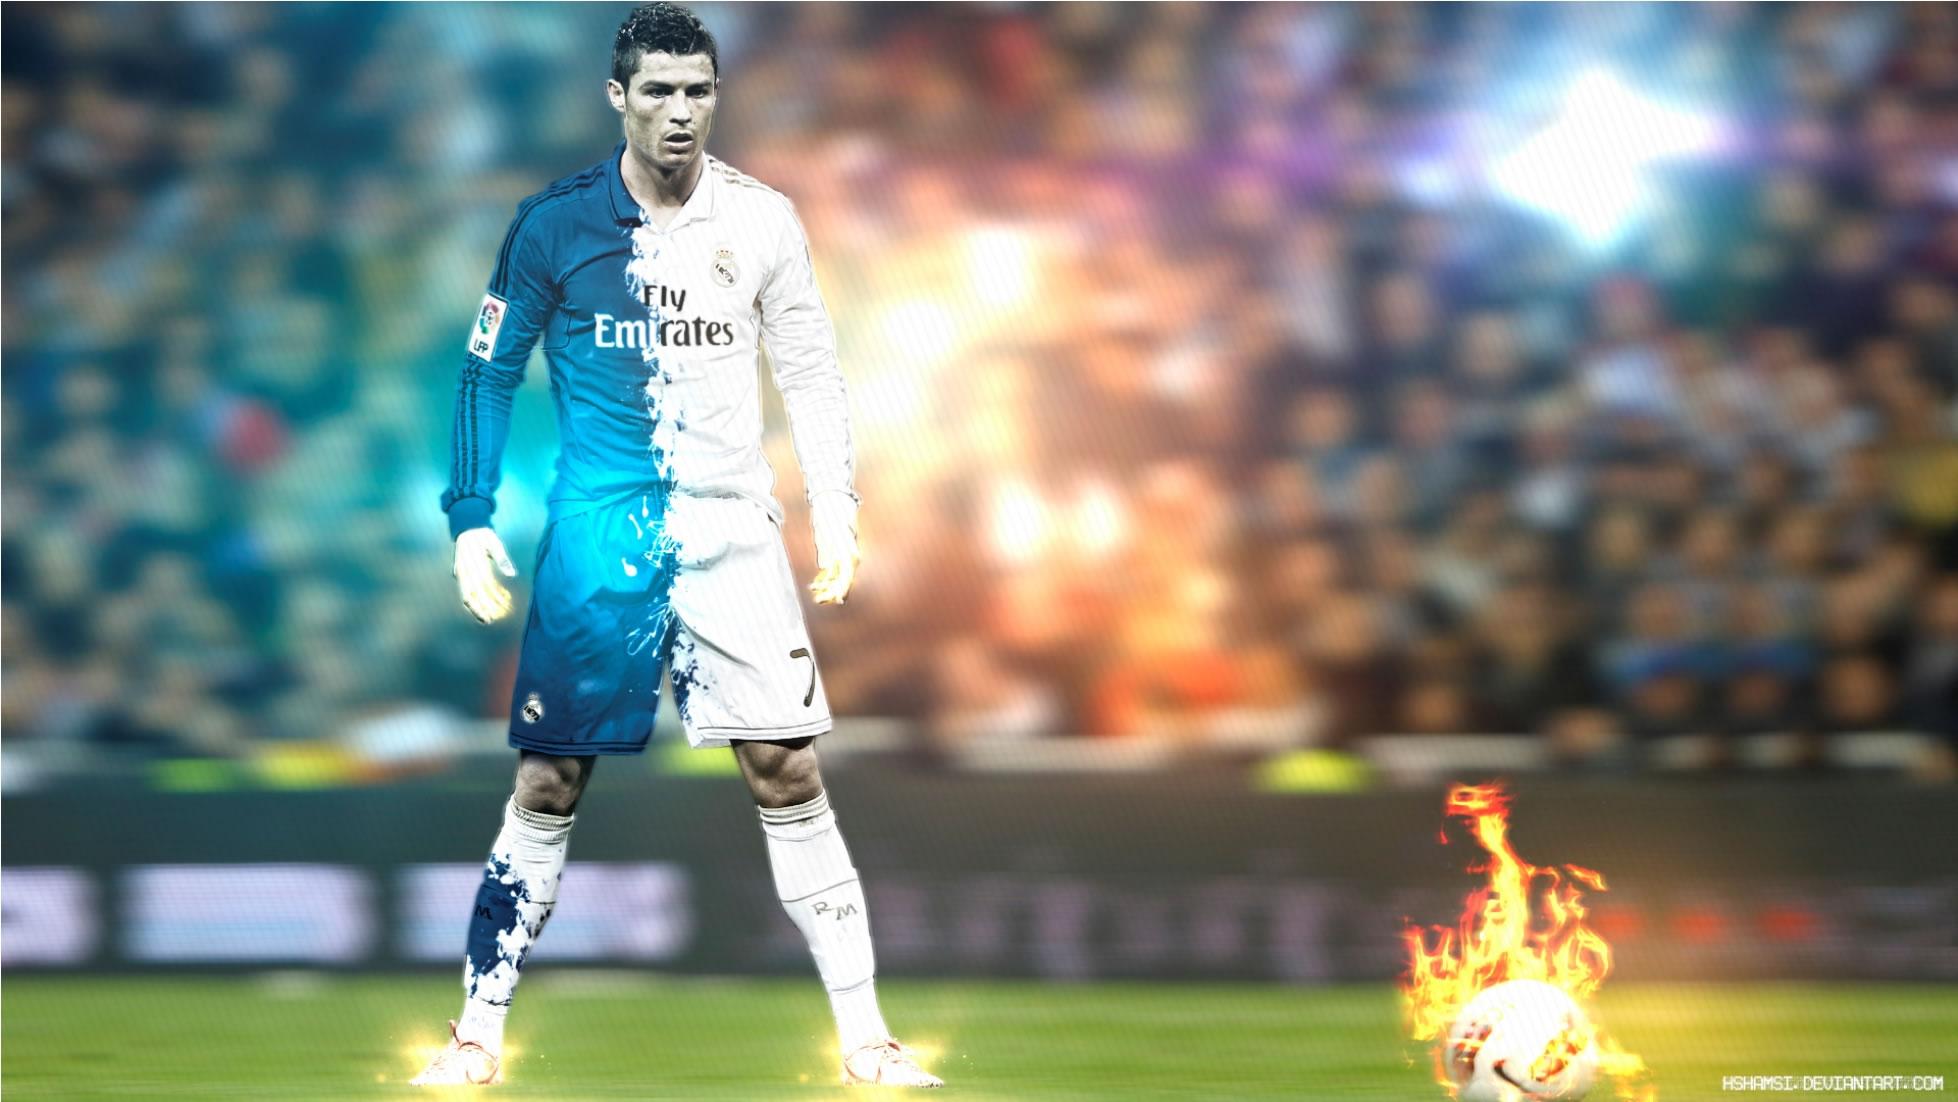 Cristiano Ronaldo wallpaper by Hshamsi - Cristiano Ronaldo Wallpapers